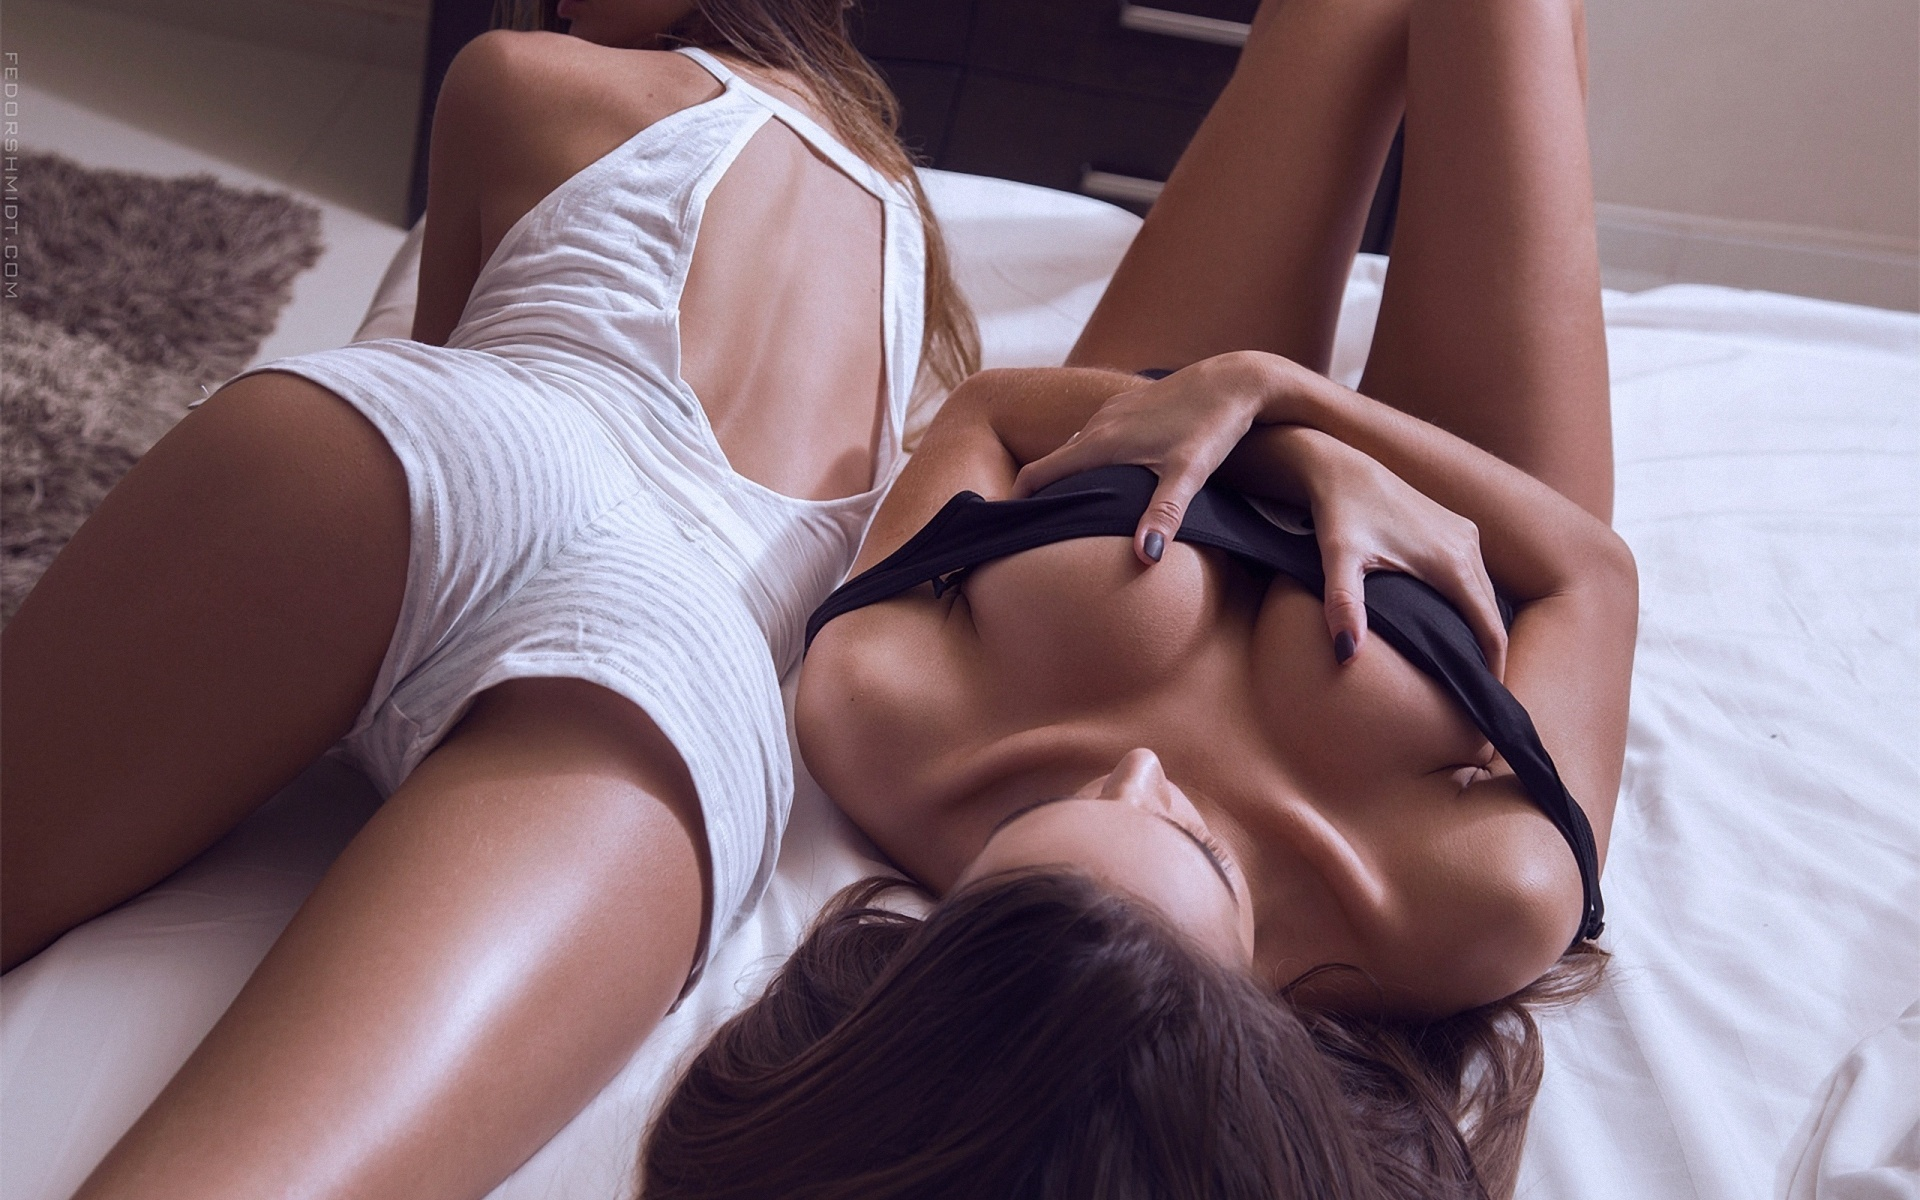 Watching sexy girls #15